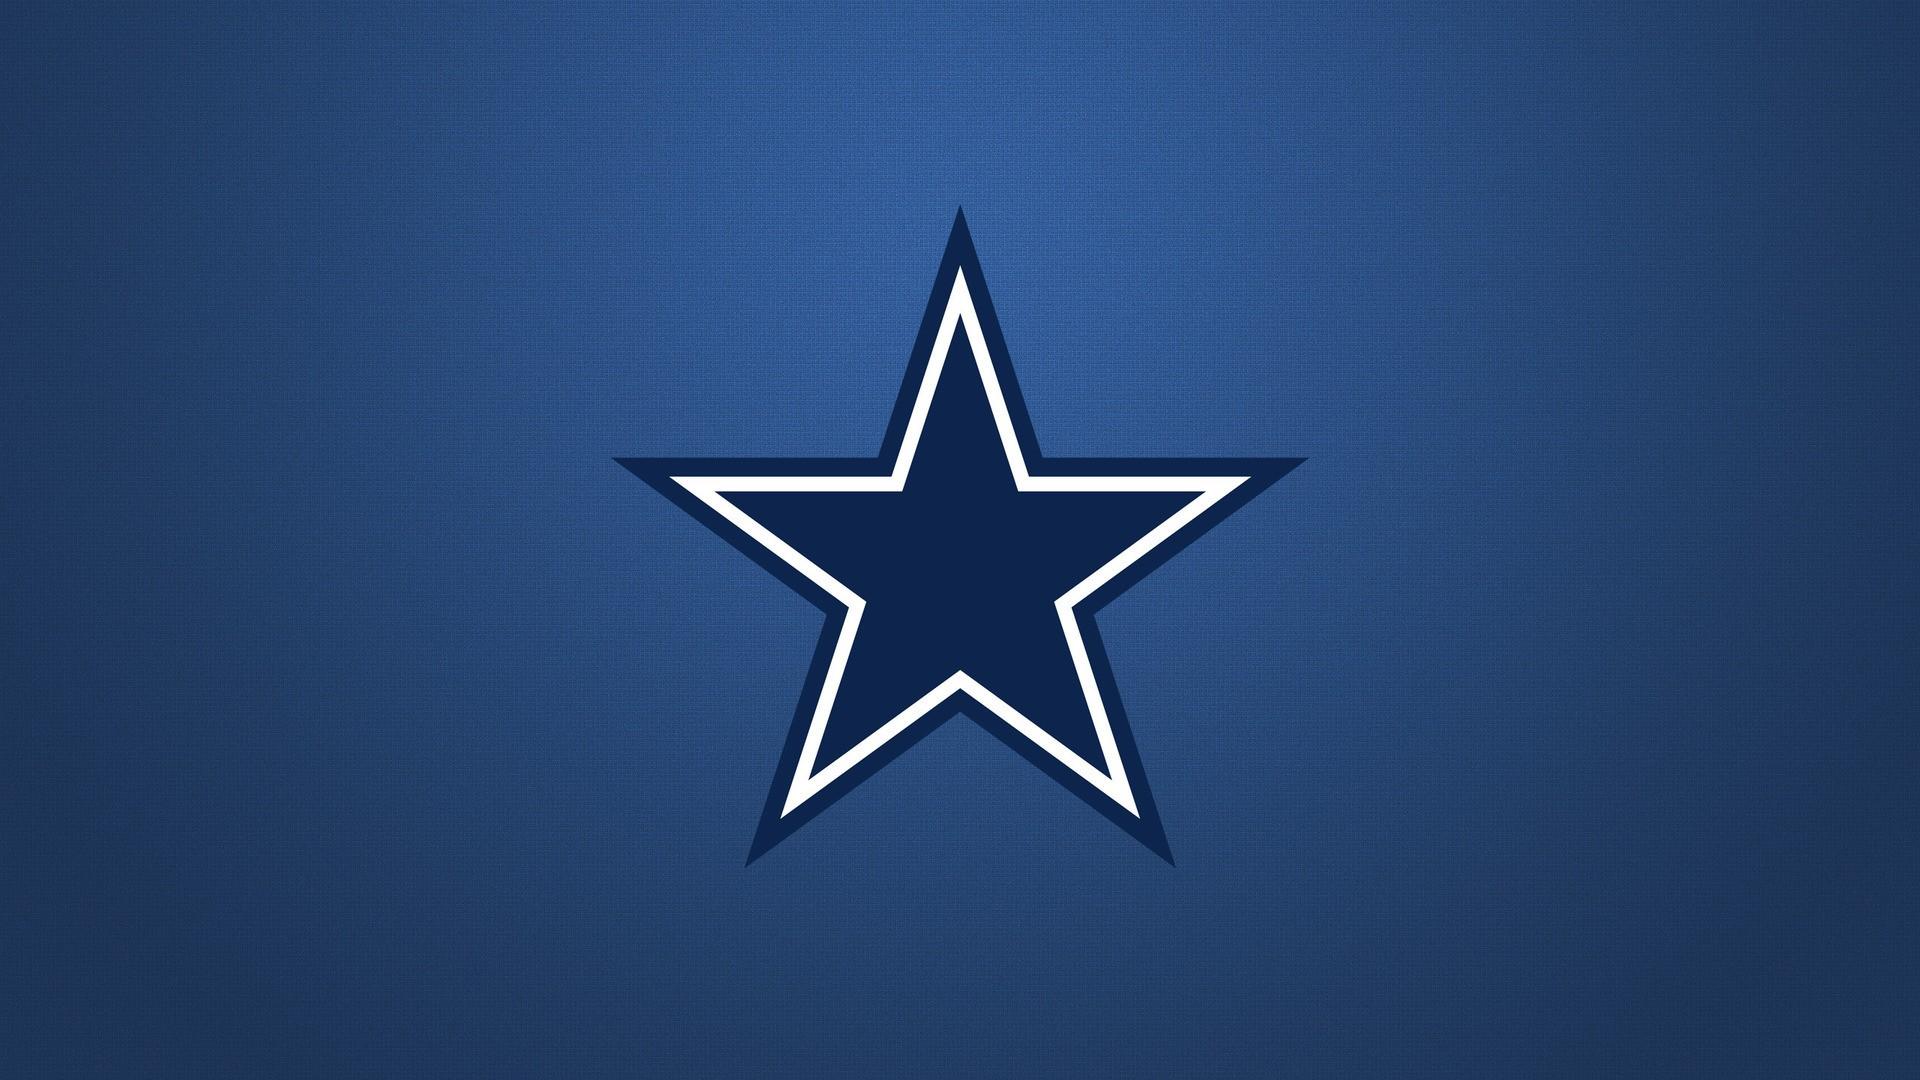 Dallas Cowboys Logo 1920x1080 Hd Wallpaper Sports Nfl Football 1920x1080